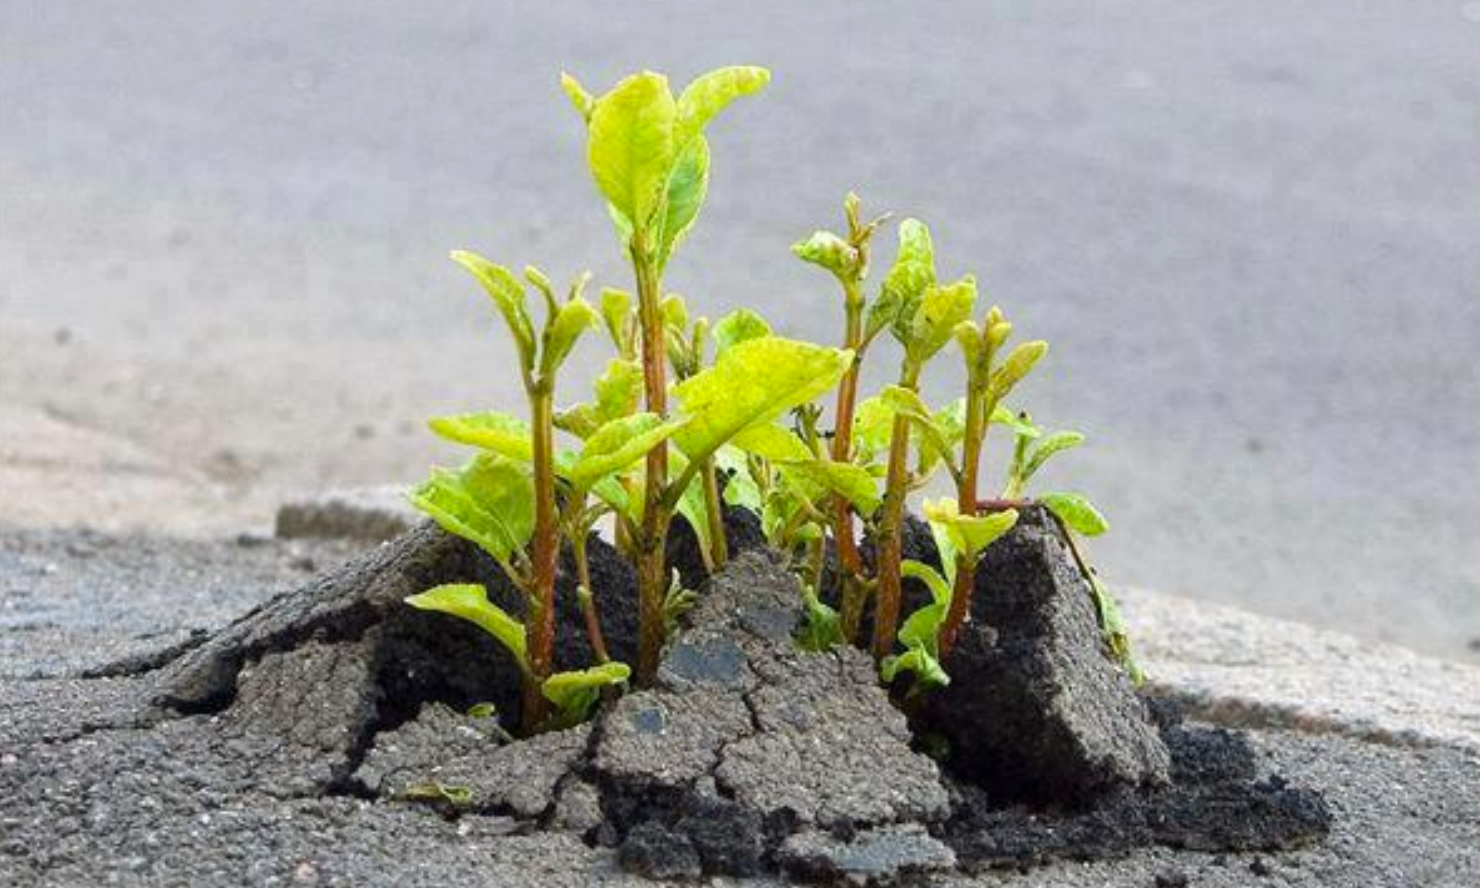 Plant breaking through pavement.jpeg